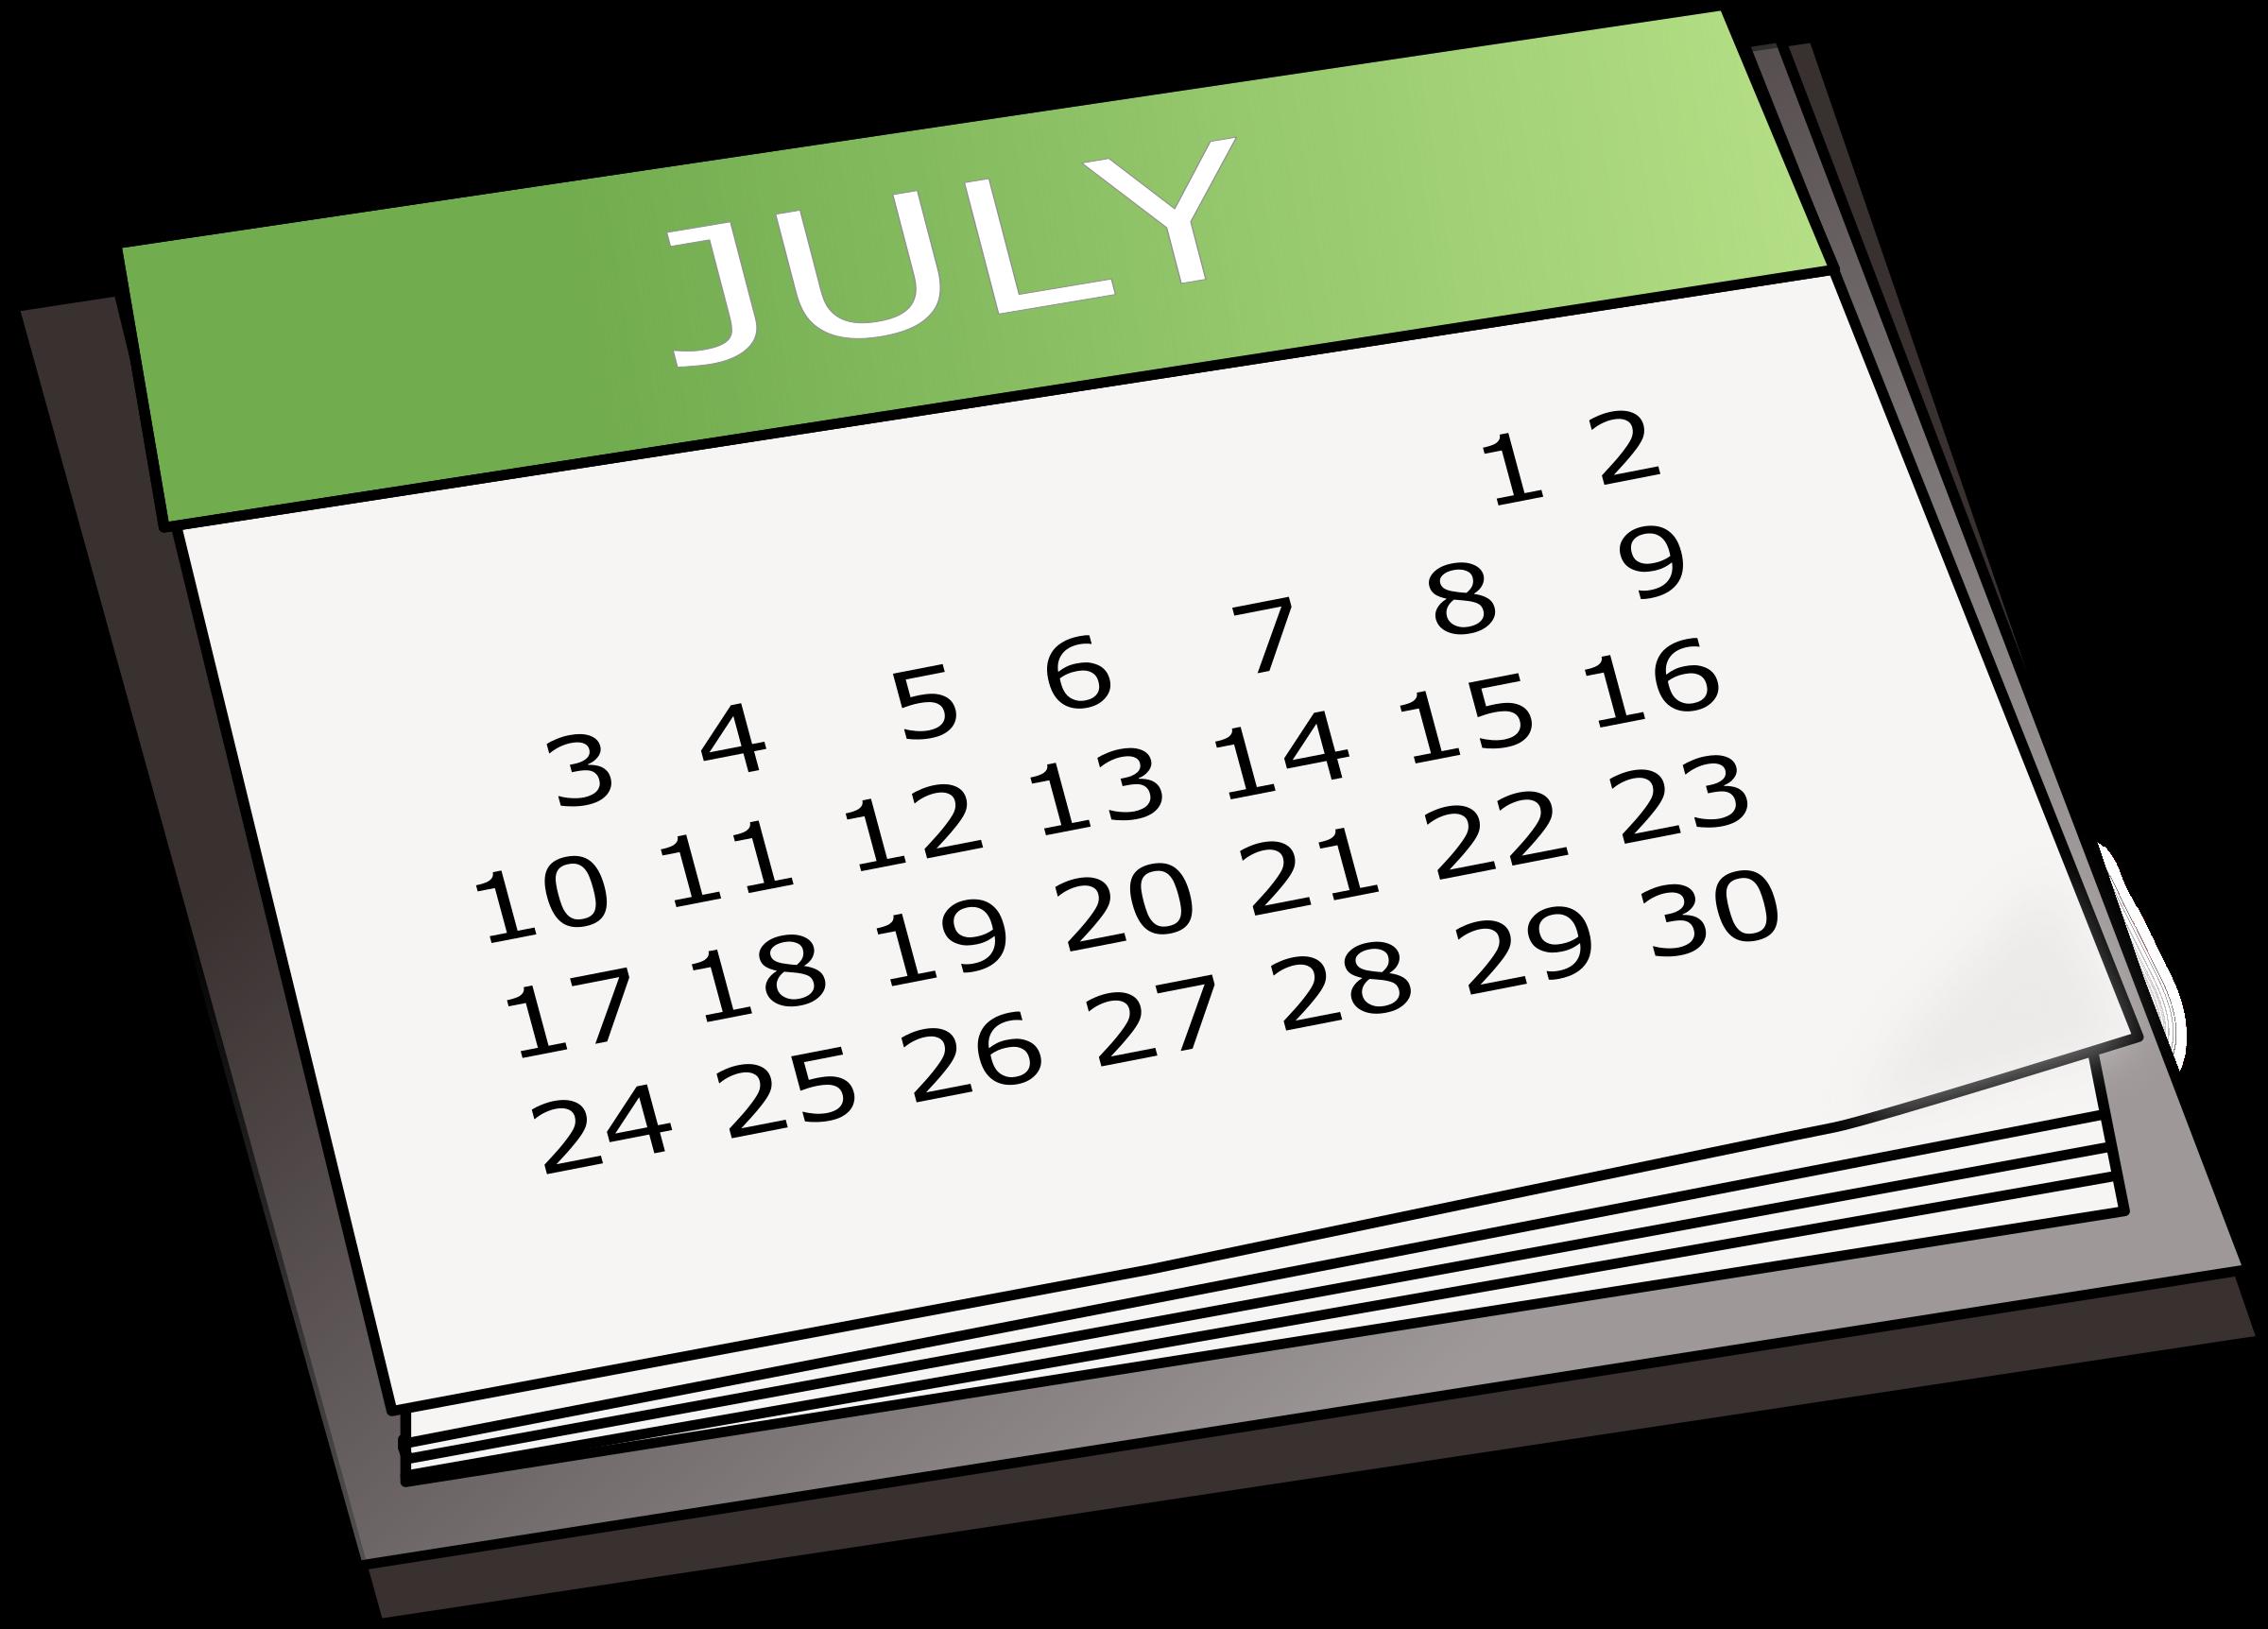 Basic calender big image. Clipart calendar month